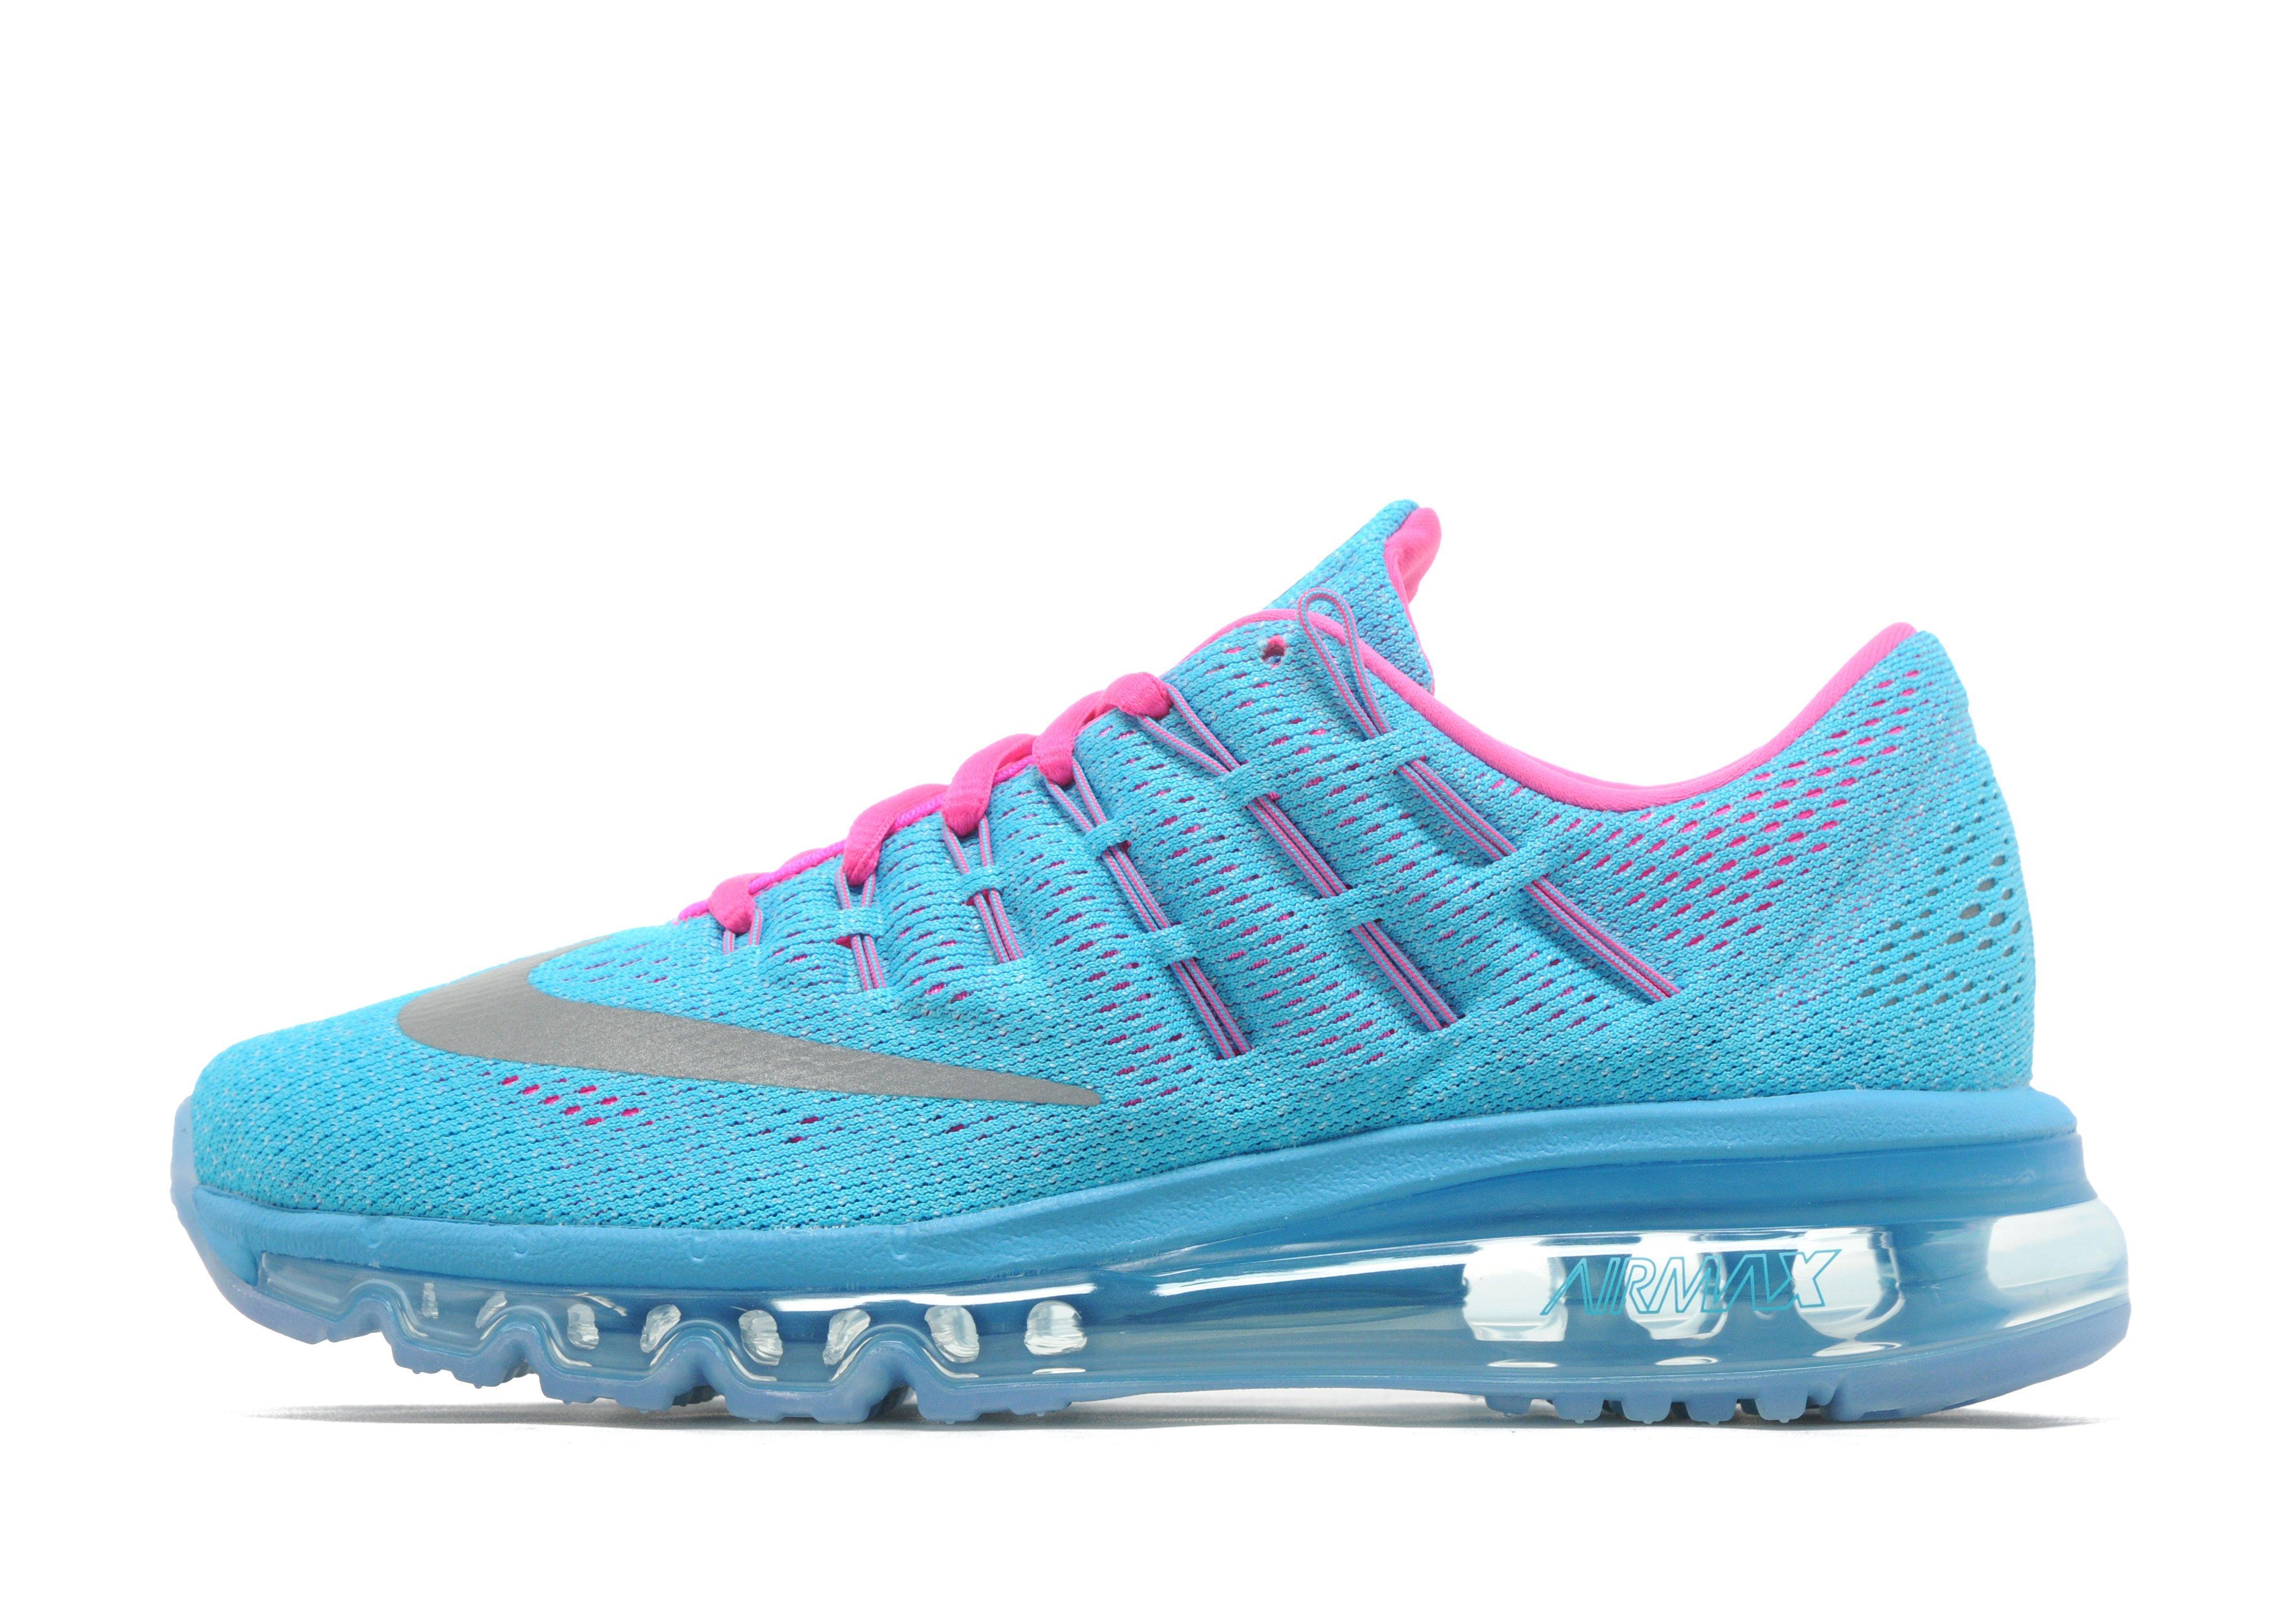 nike air max roze met blauw